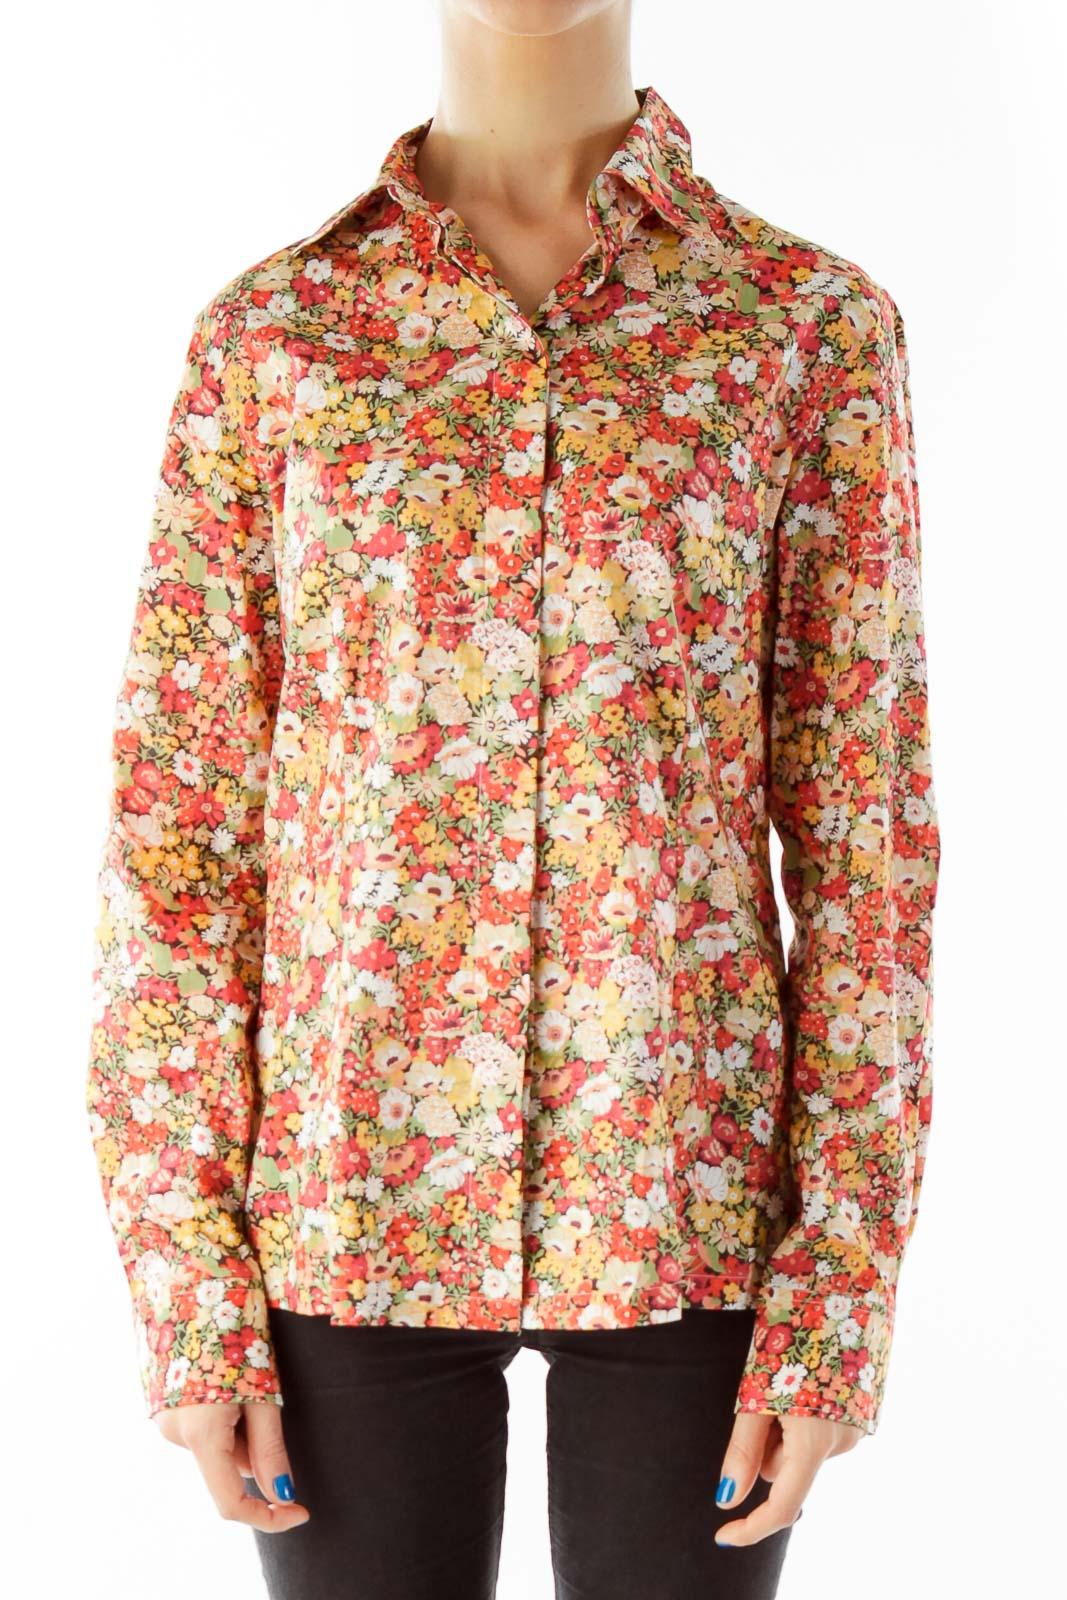 Orange Flower Print Shirt Front